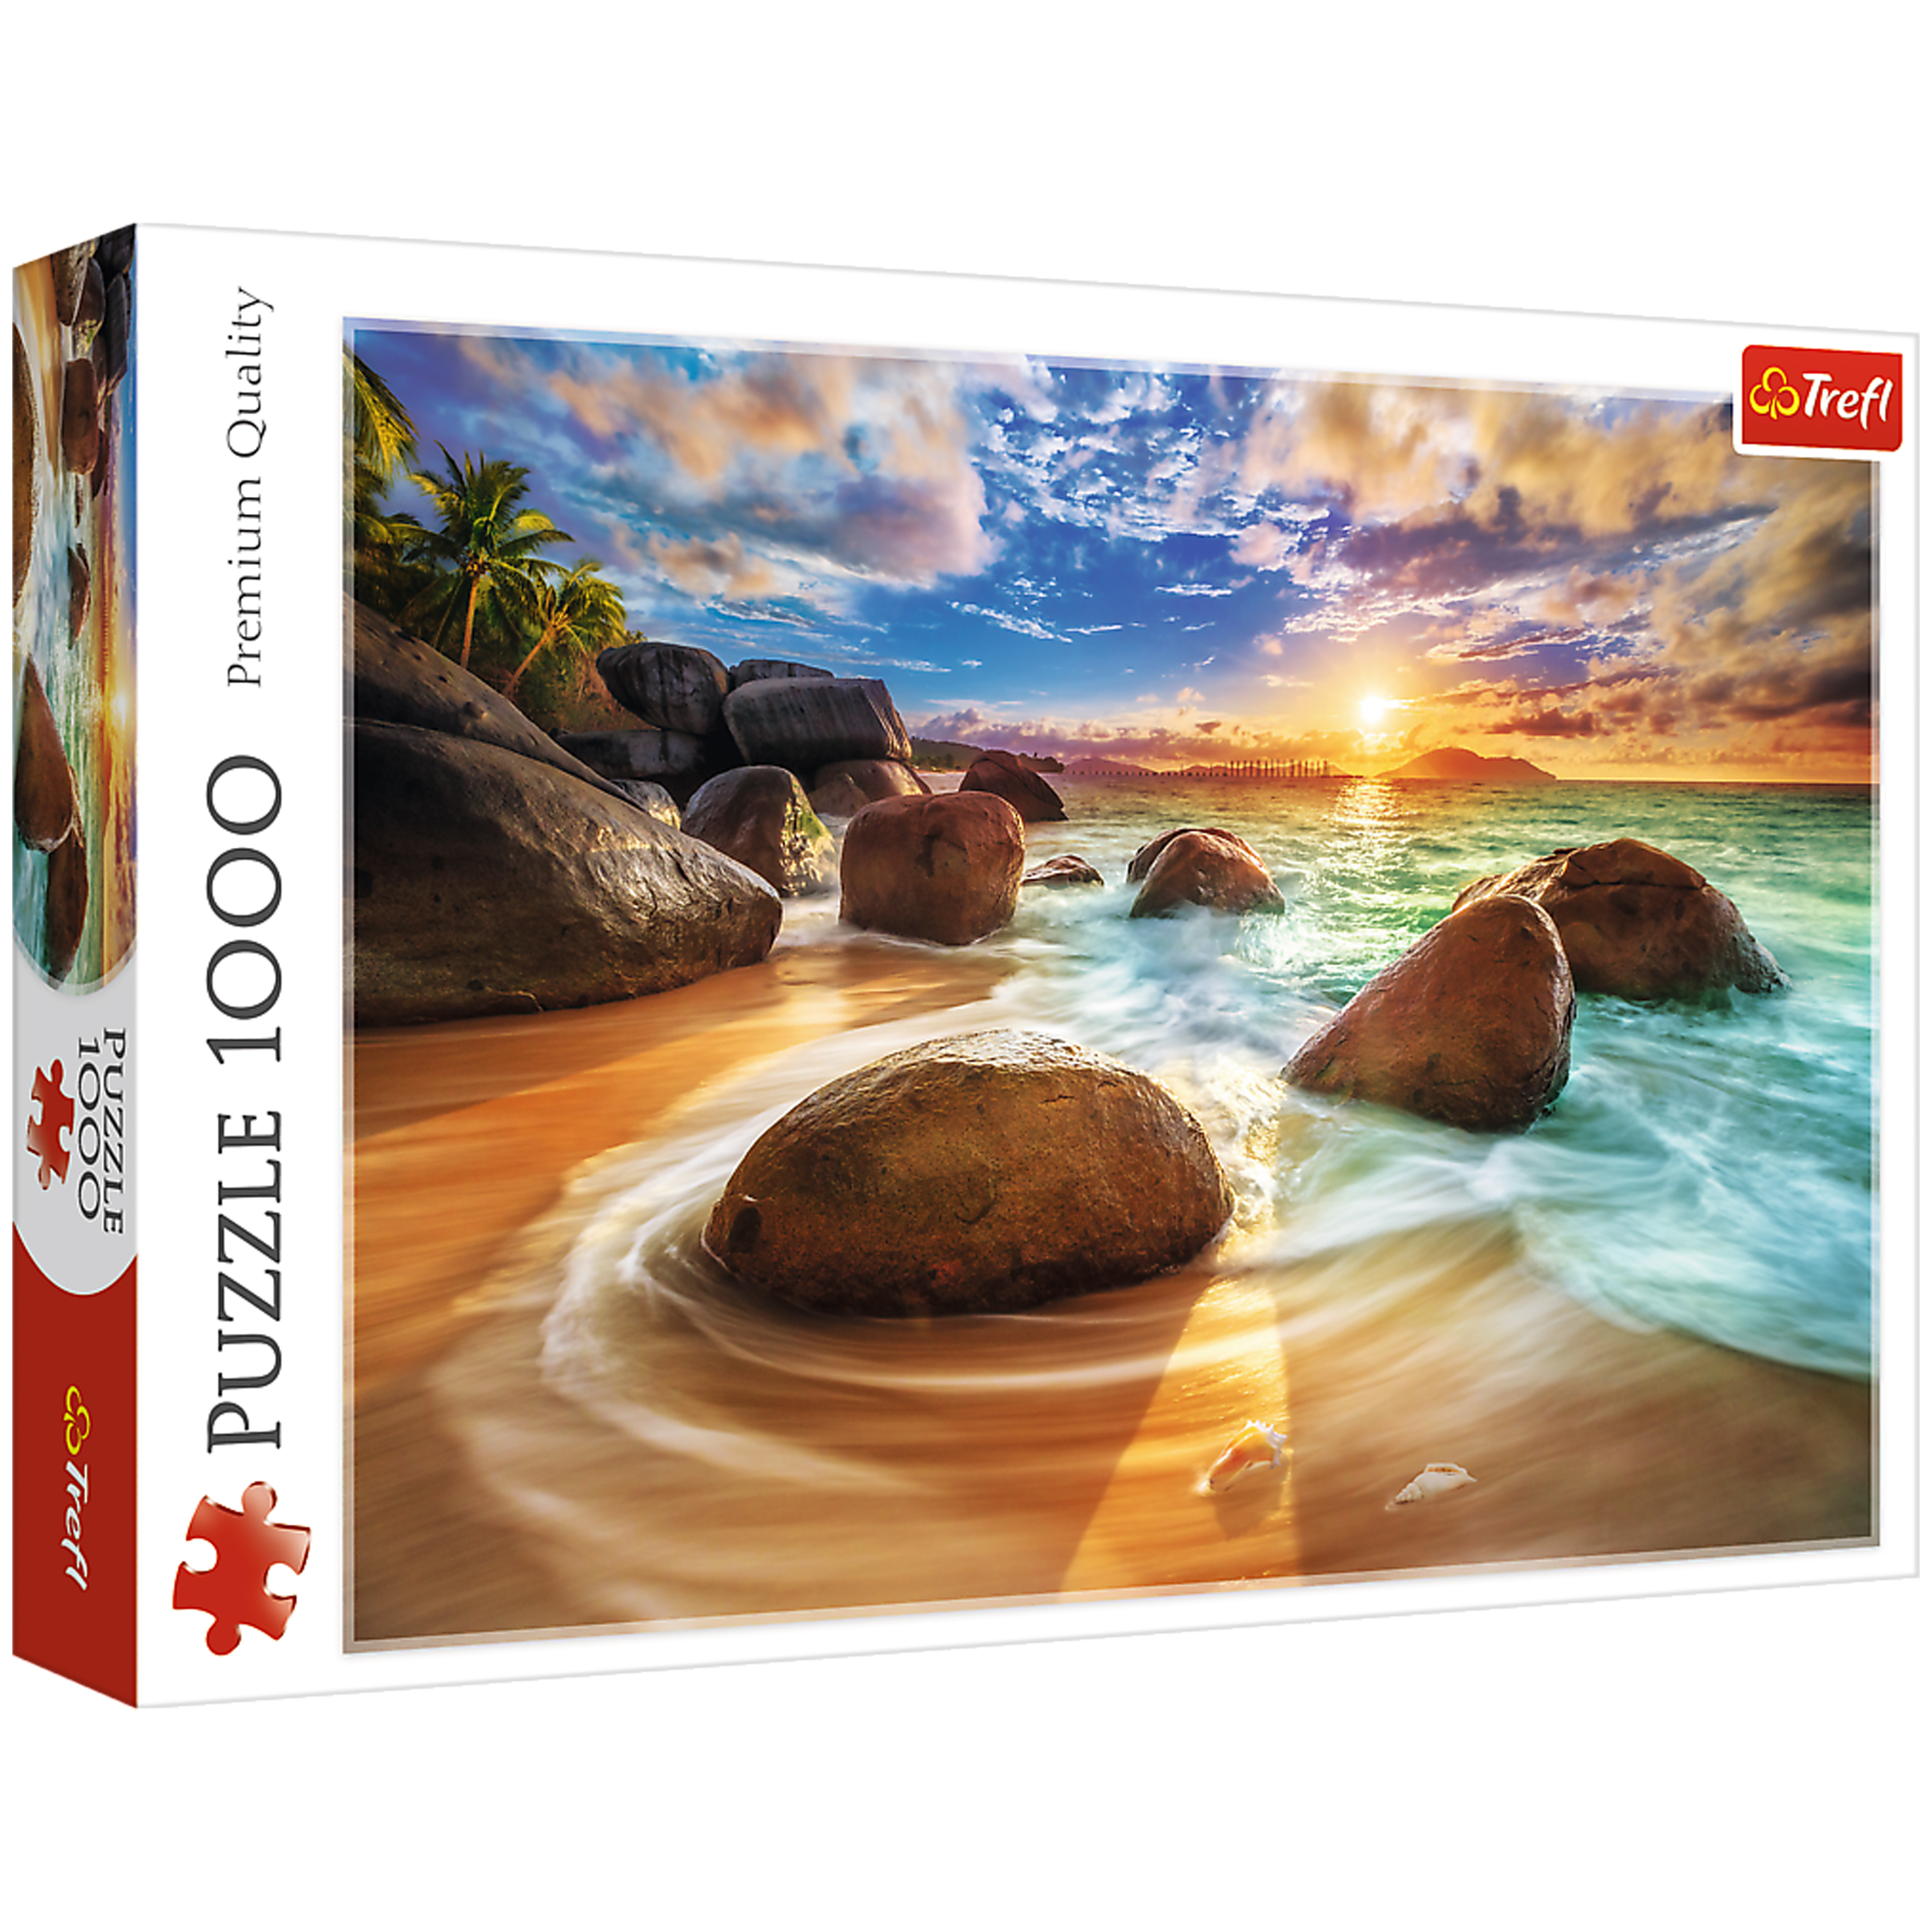 پازل 1000 تکه تریفل مدل India Samudra Beach